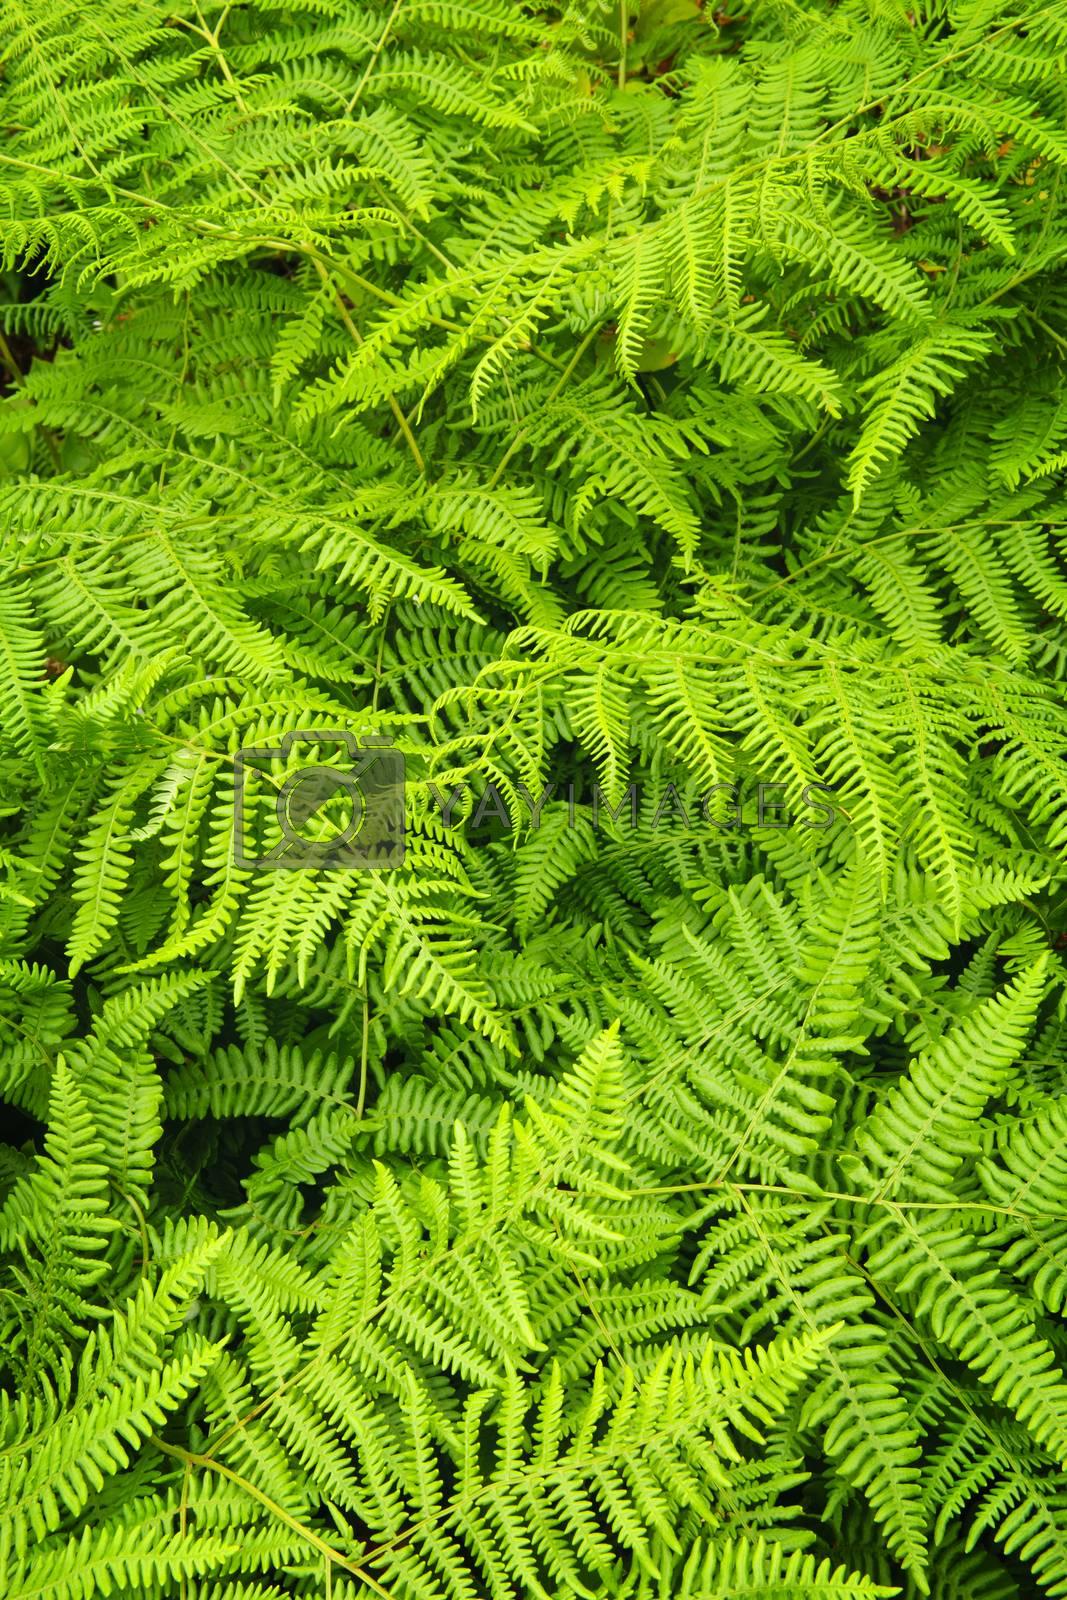 Background of lush bright green fern plants